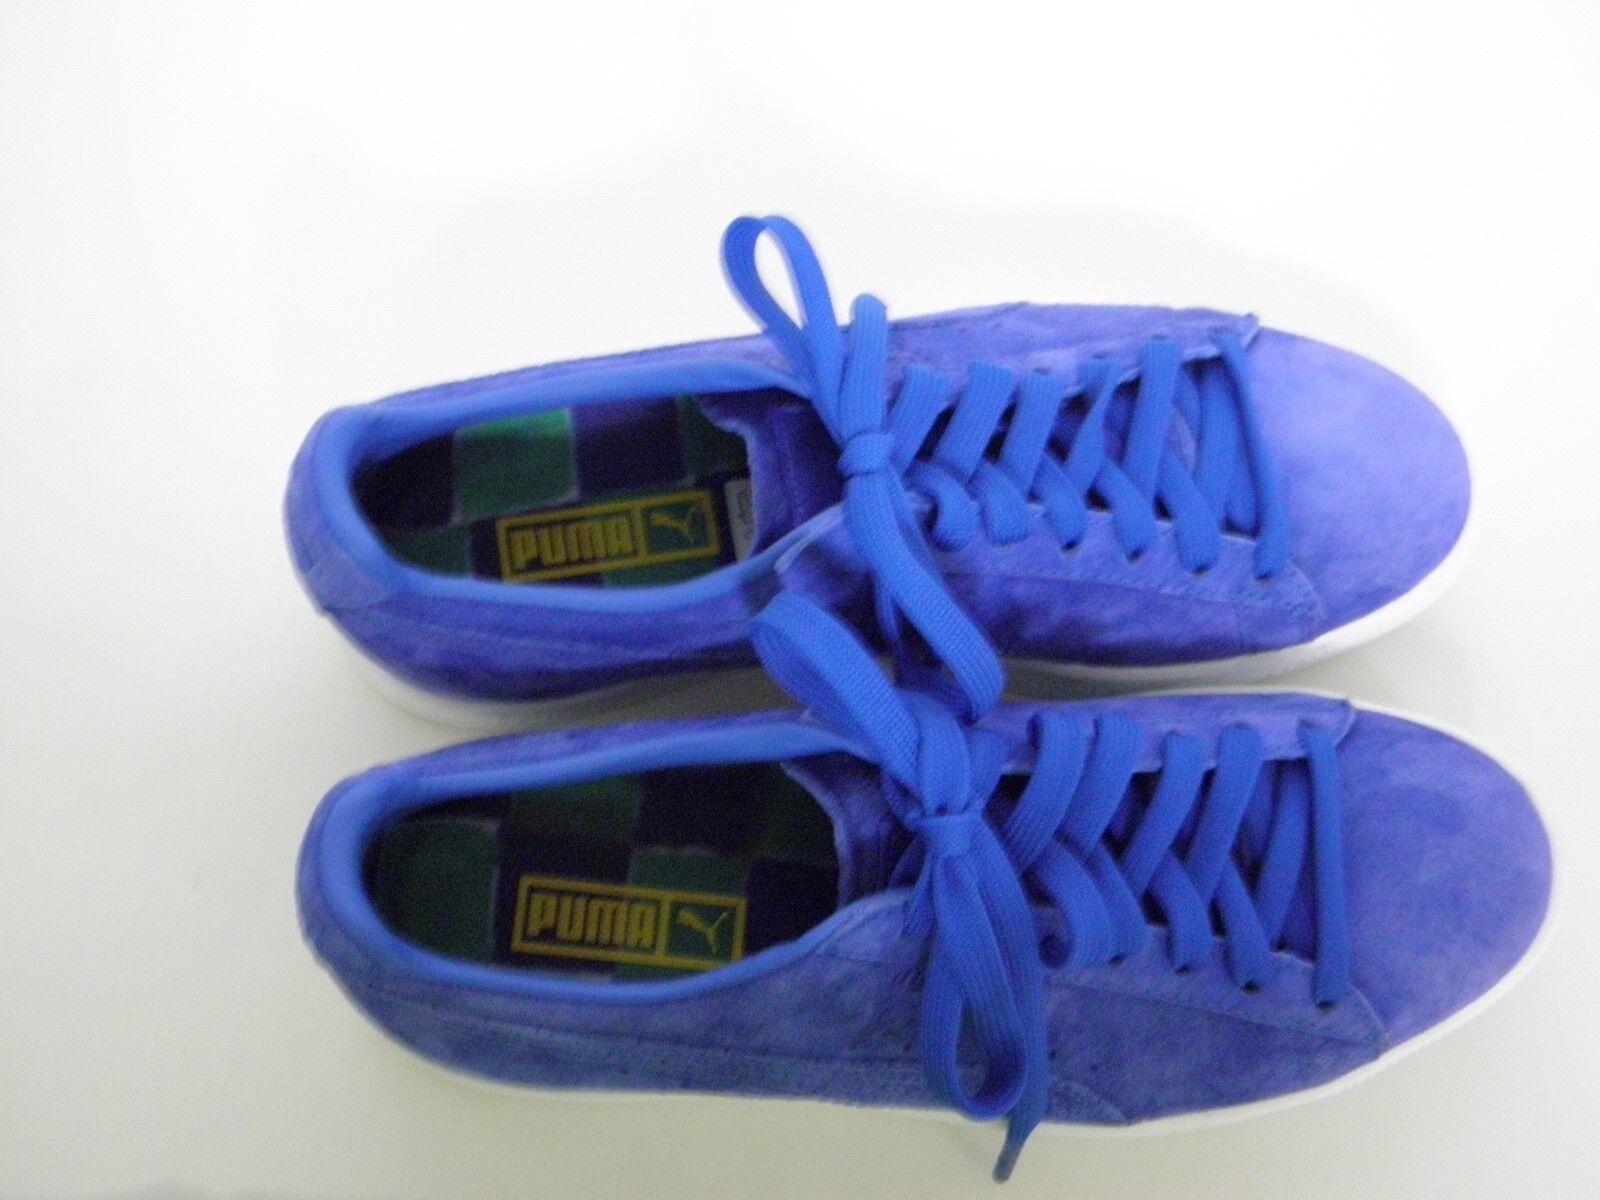 Puma Clyde MJRL FM, Dazzling Blau Dazzling Blau, Größe 7, 7, 7, Athletic Turnschuhe schuhe a16fae